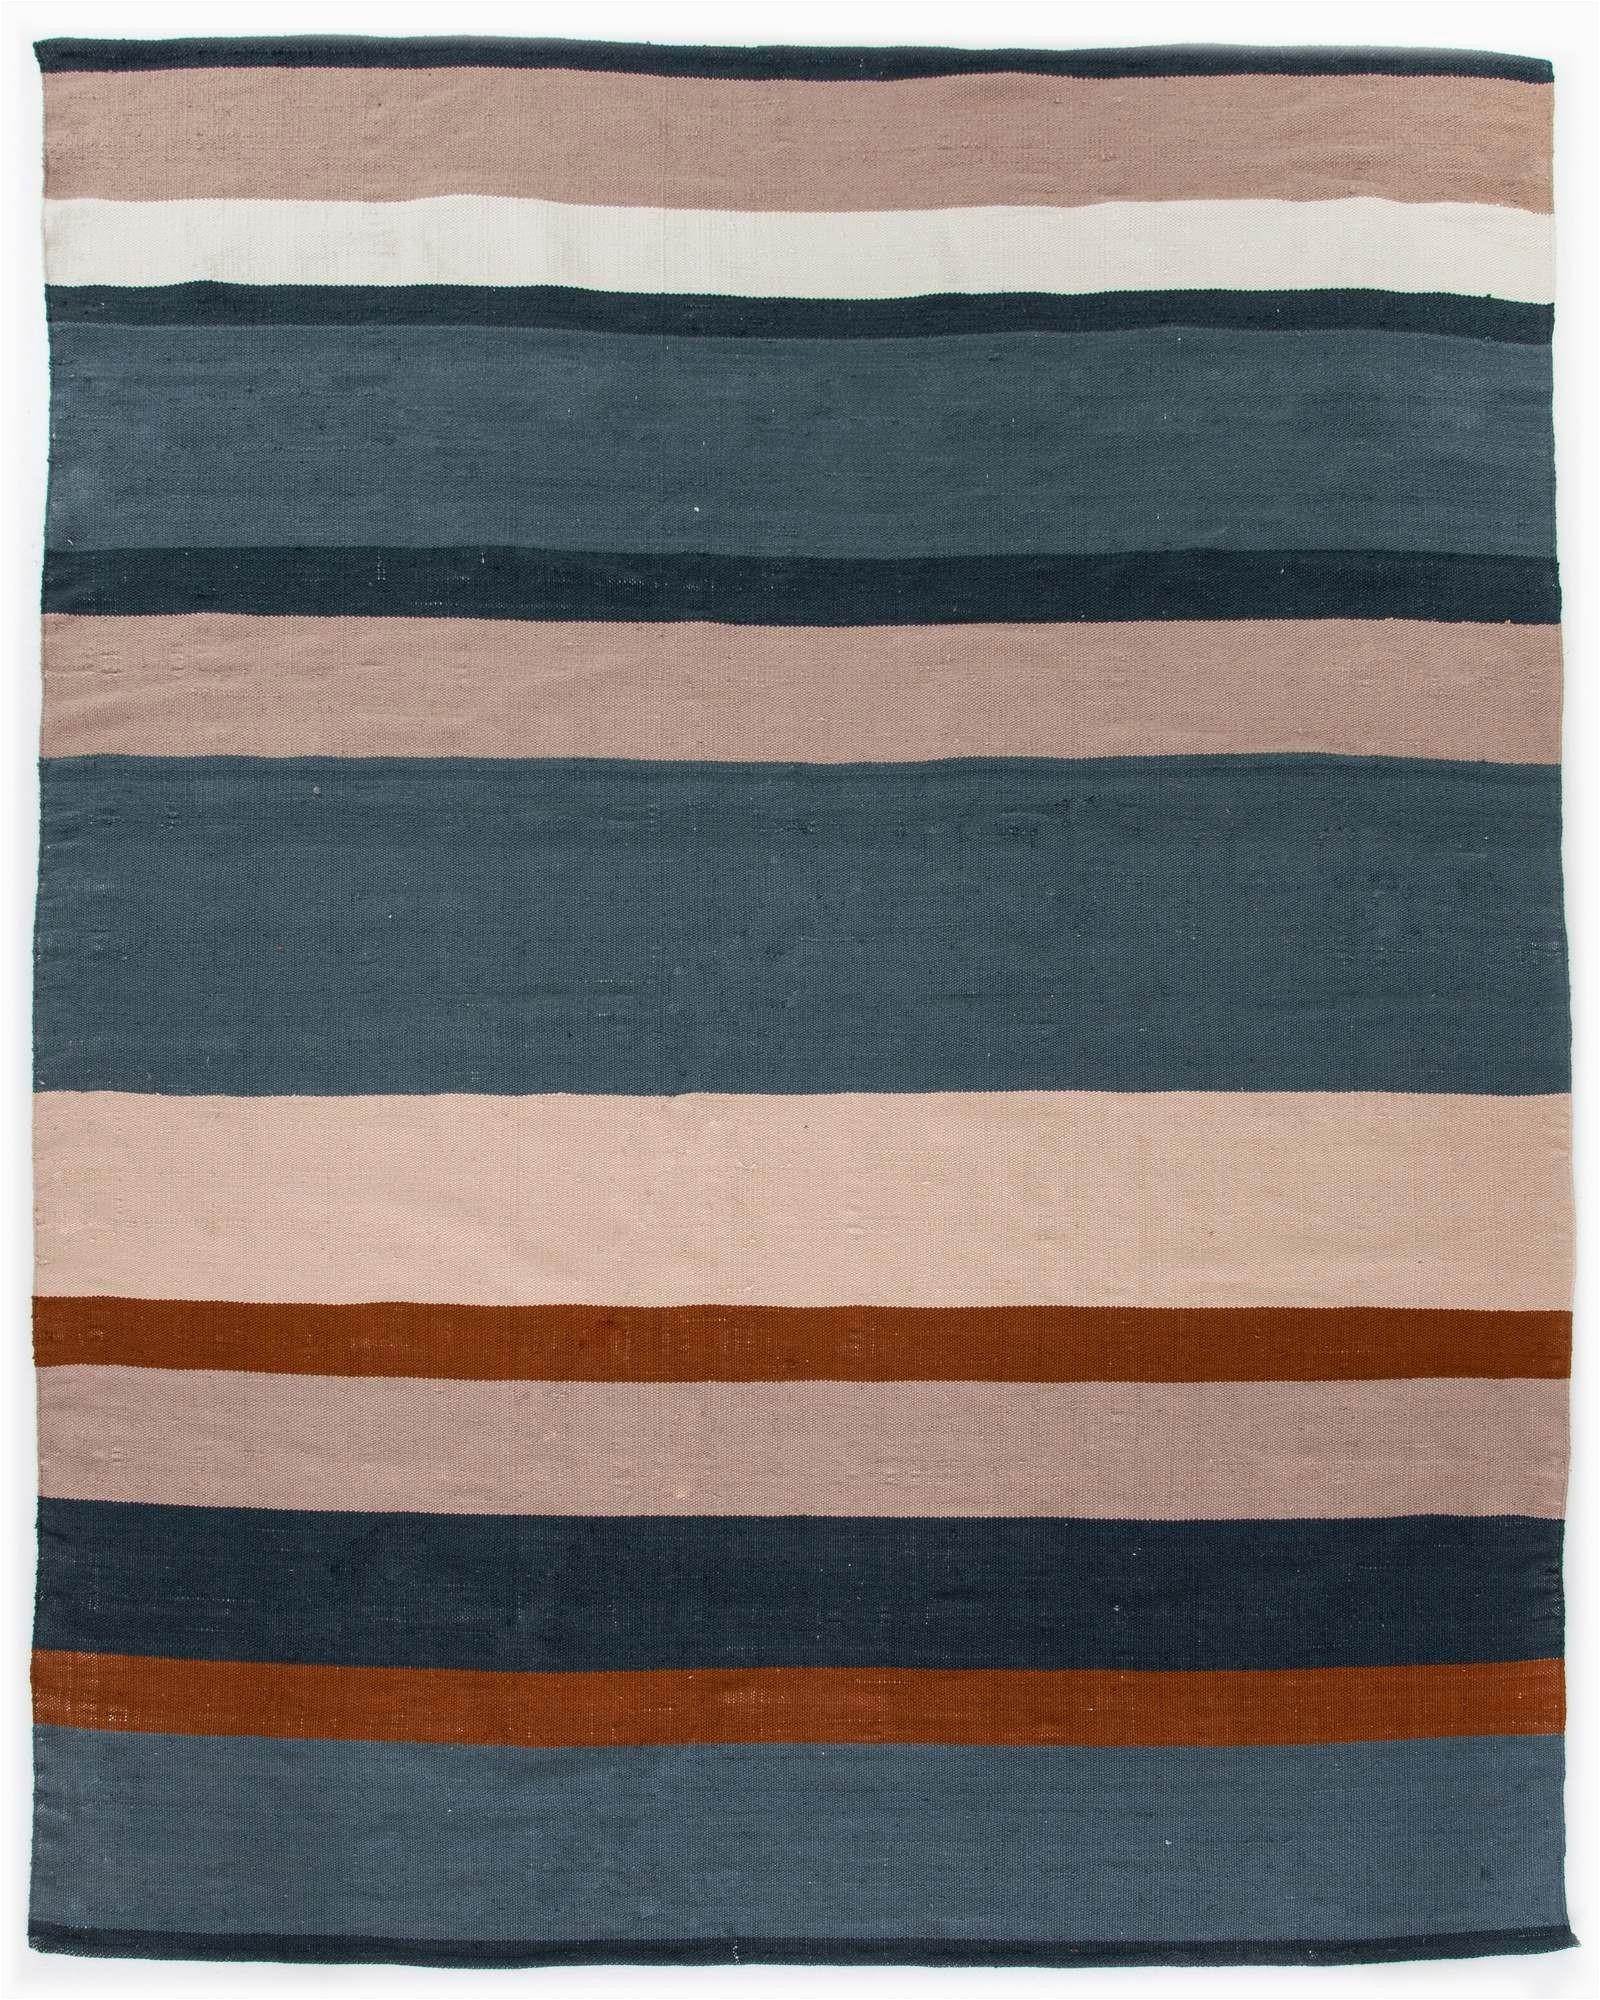 senna outdoor rug in navyorangeblush in 5x8